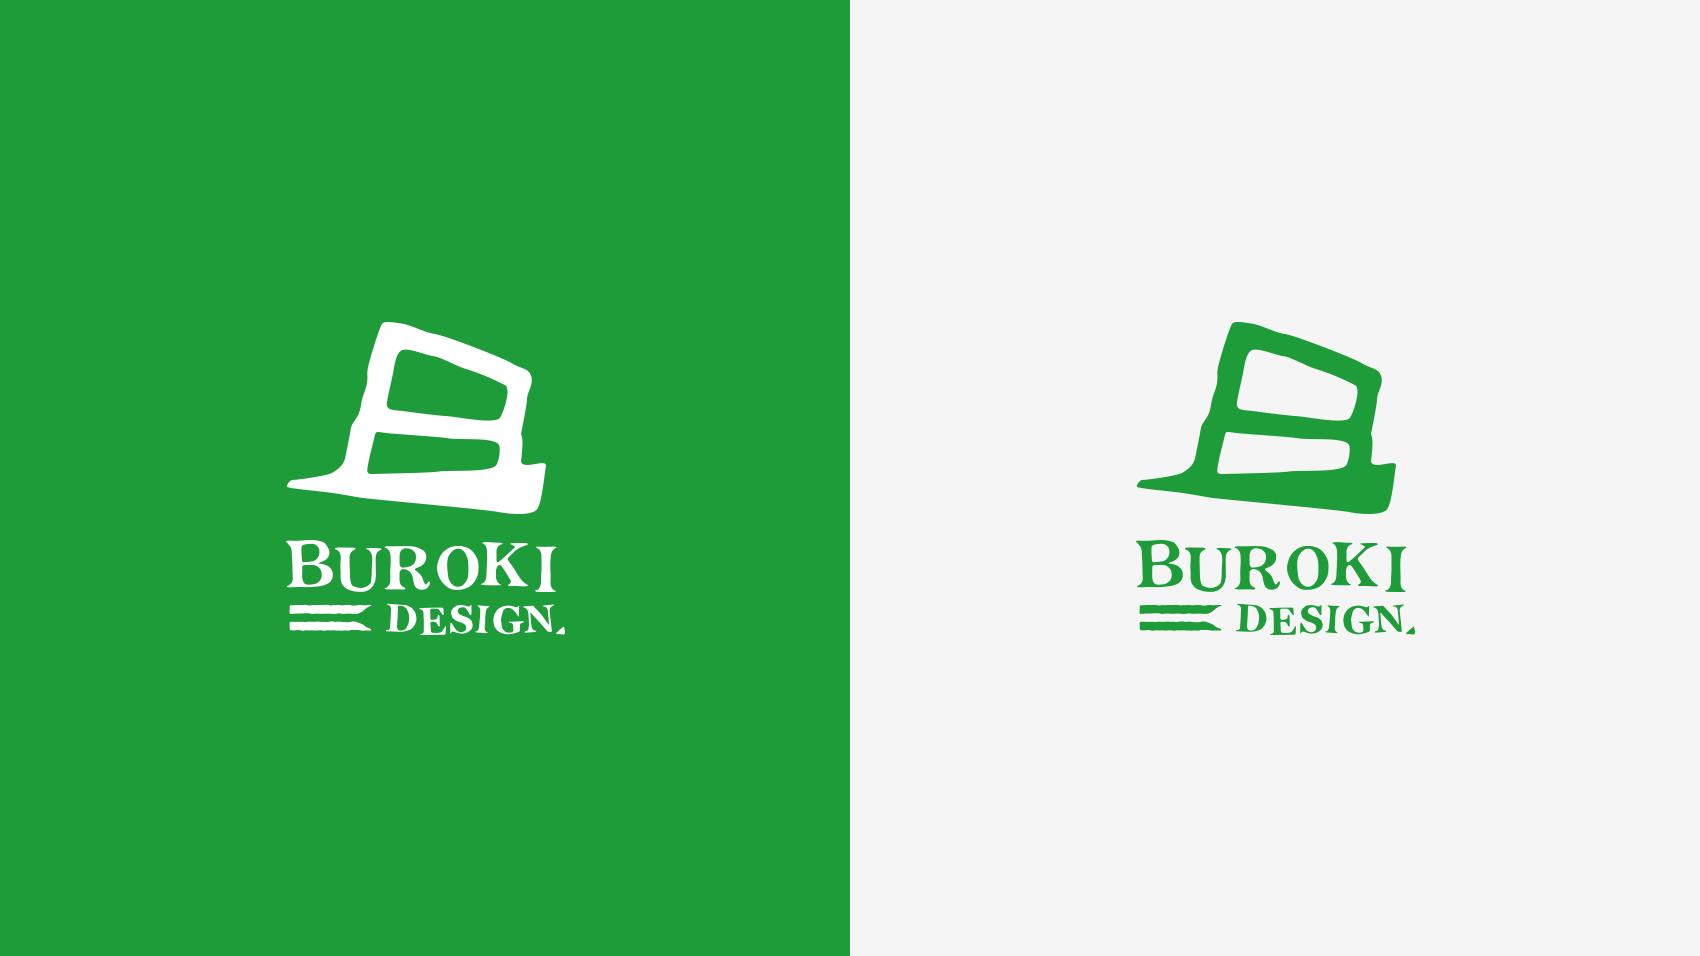 BUROKI design開始当初のロゴ